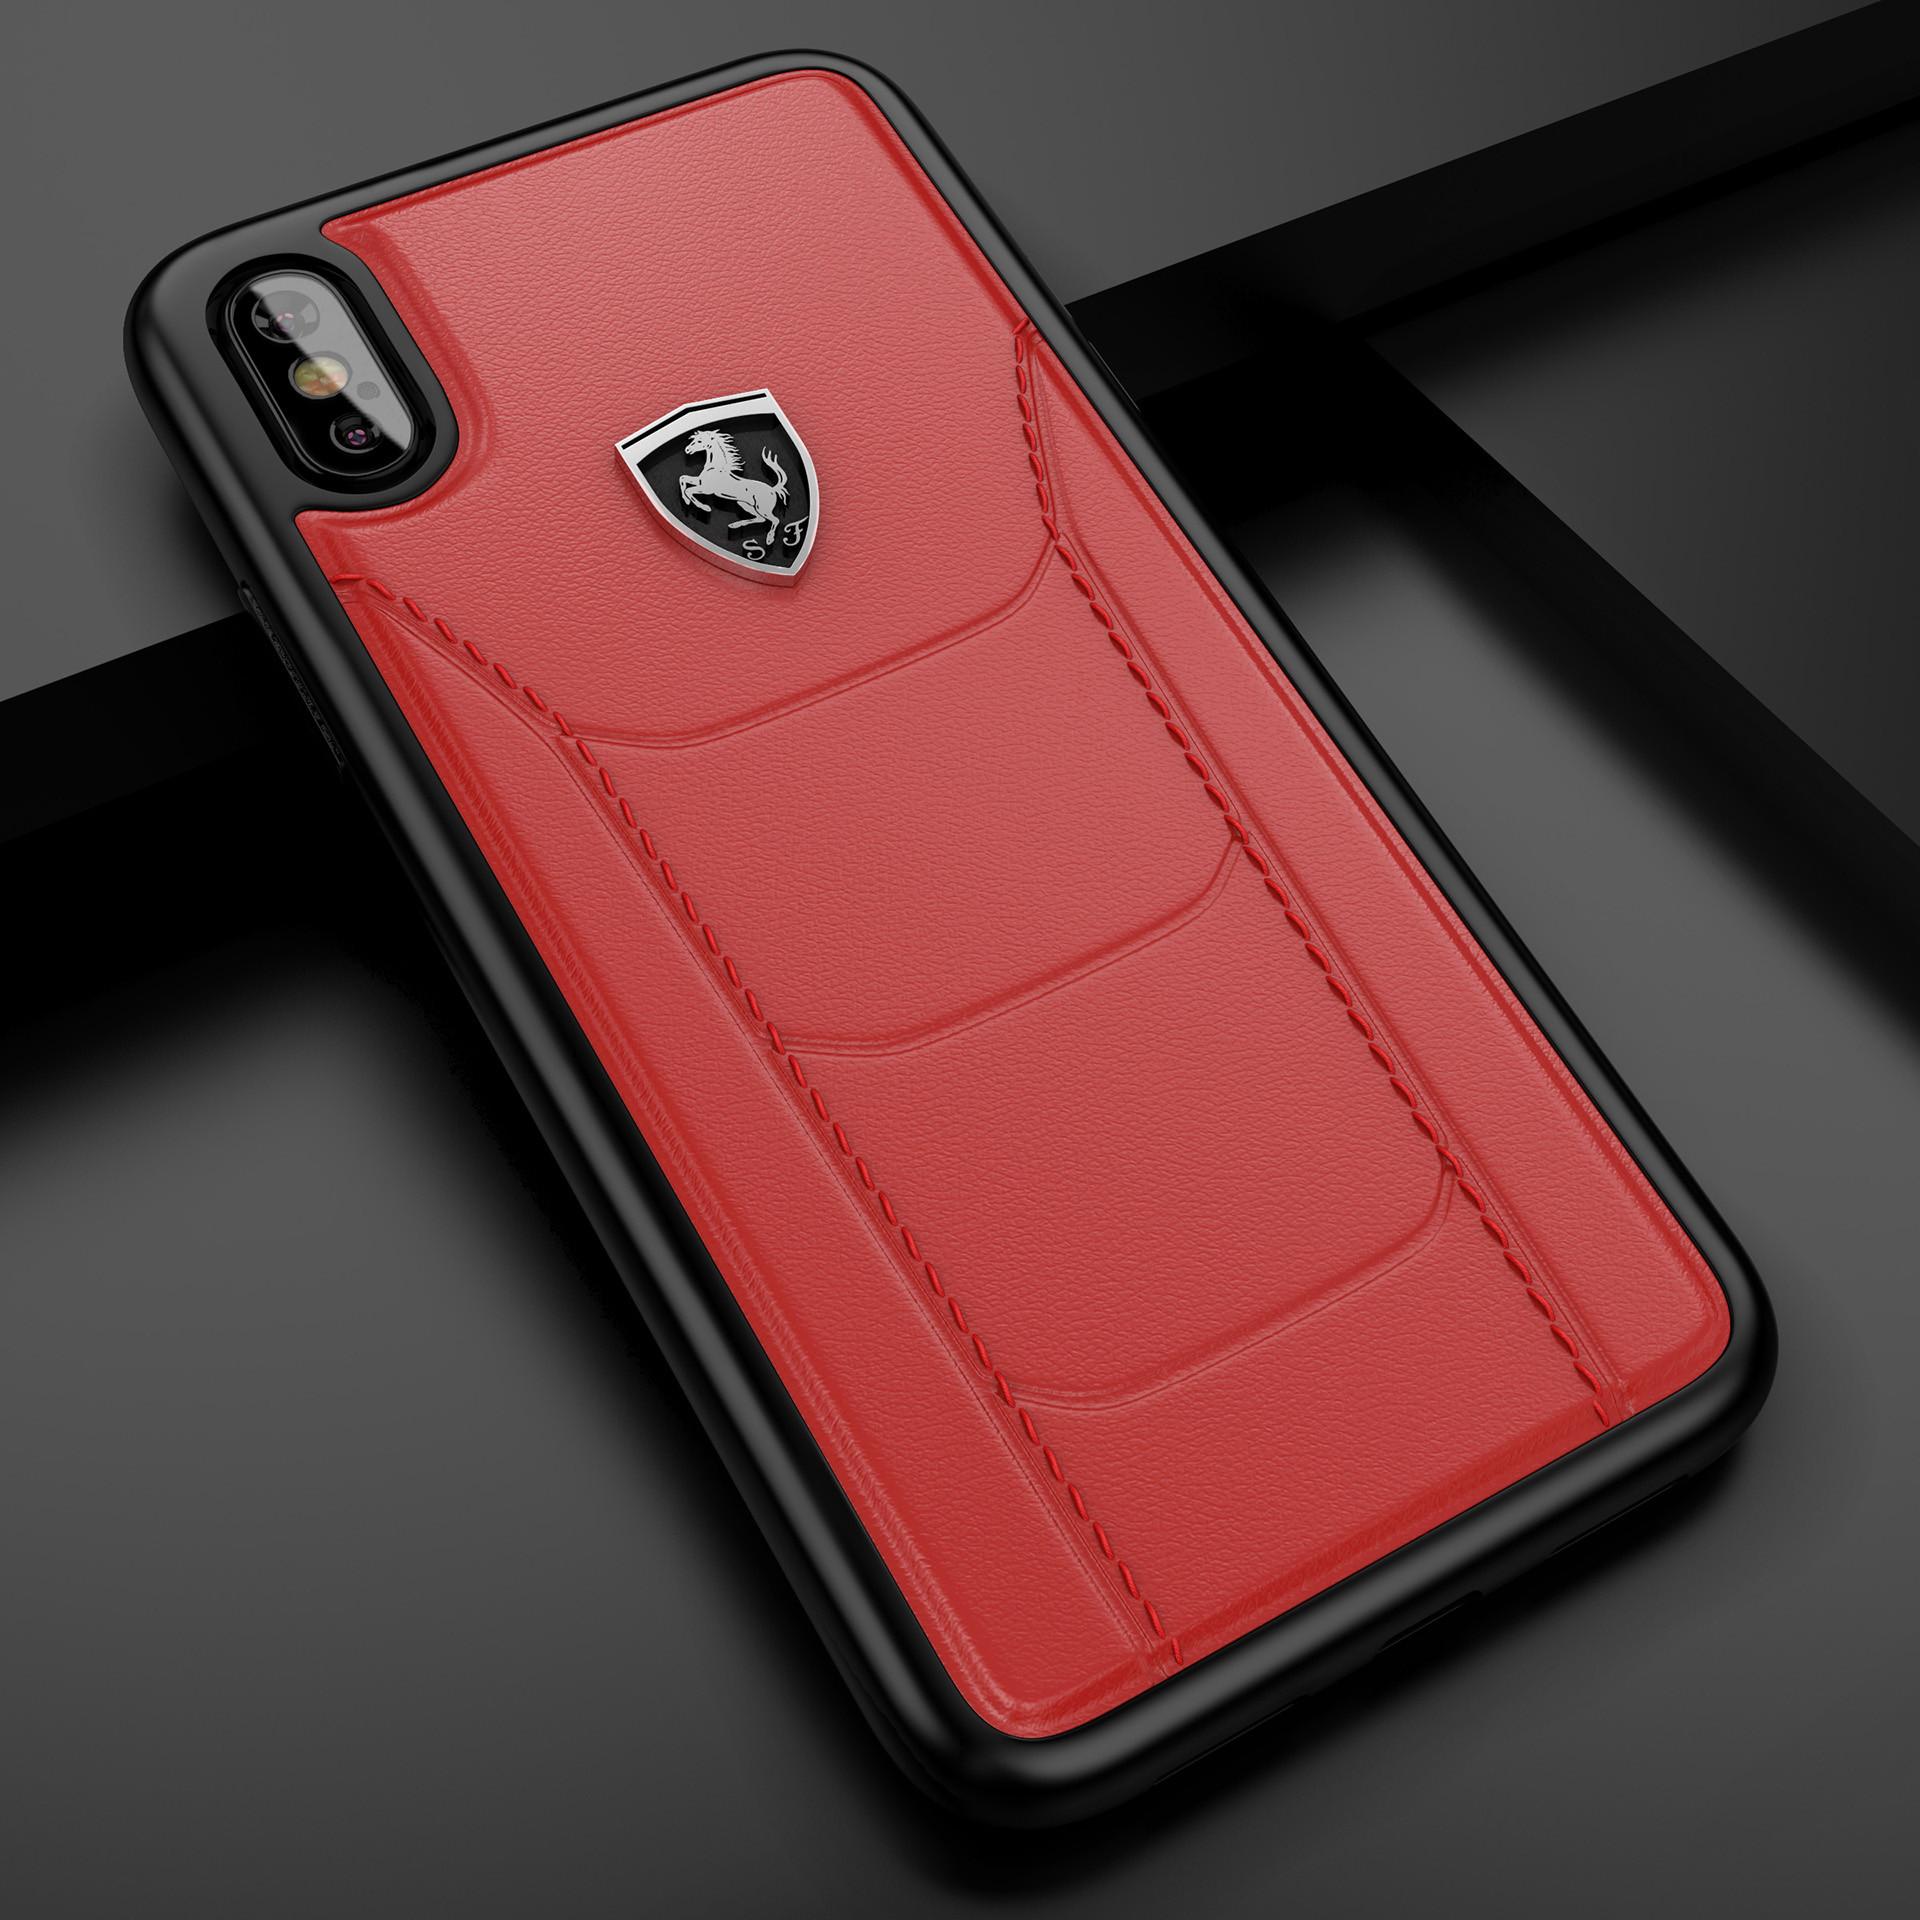 iphone xs max ferrari leather case